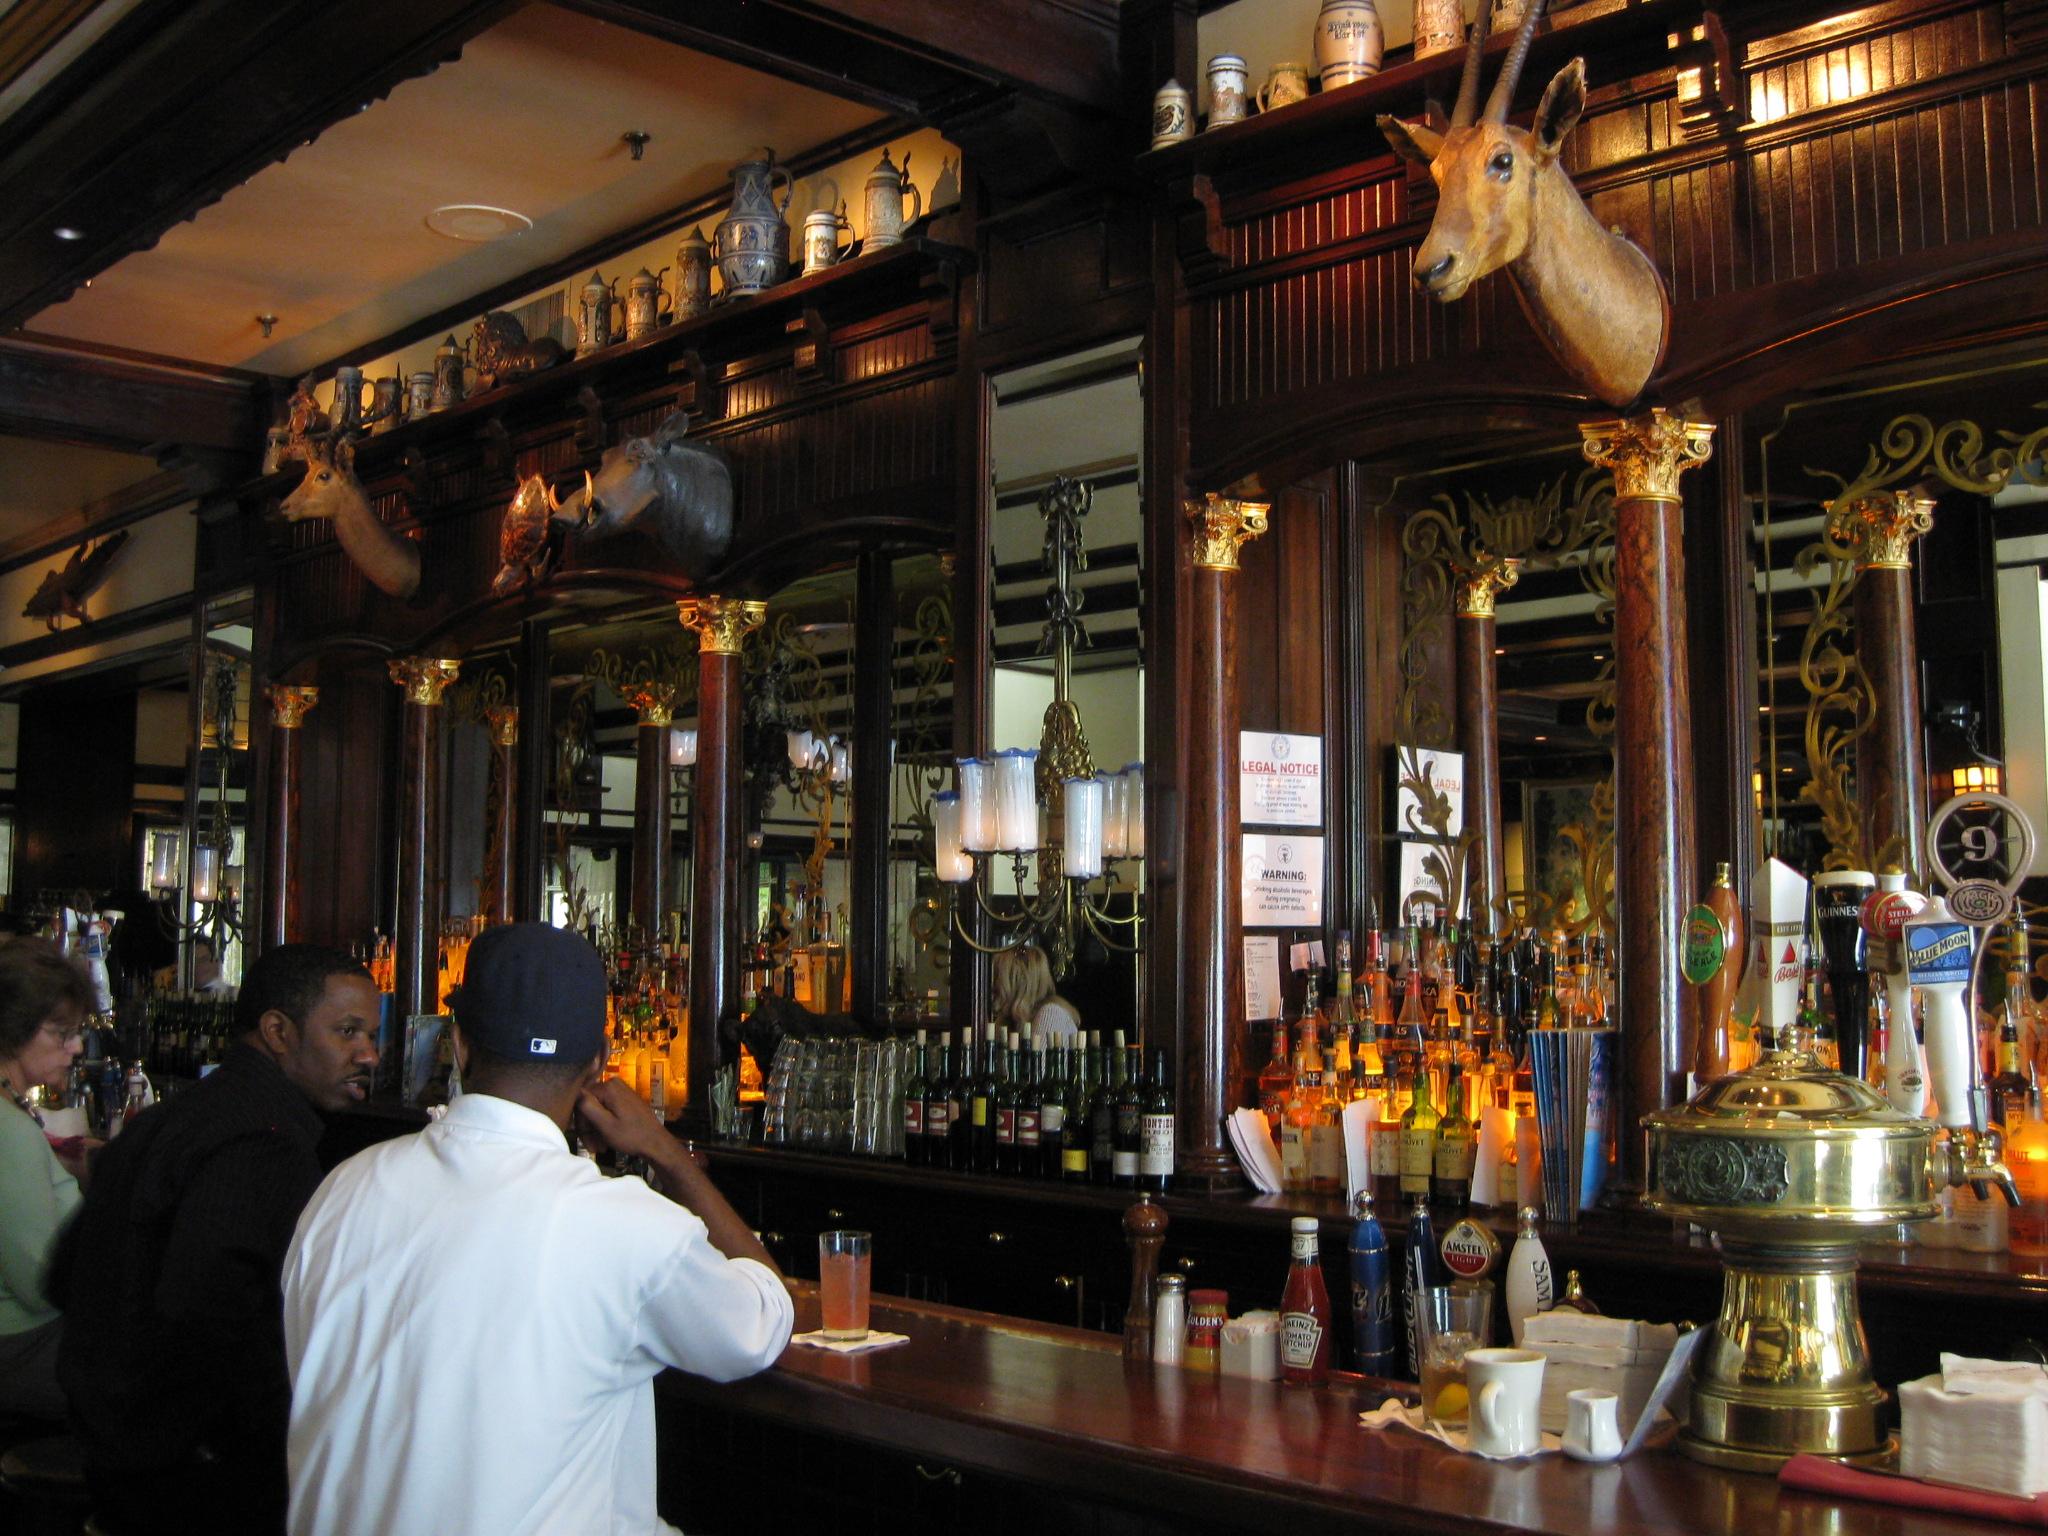 Grill Restaurant Birmingham Ladypool Road